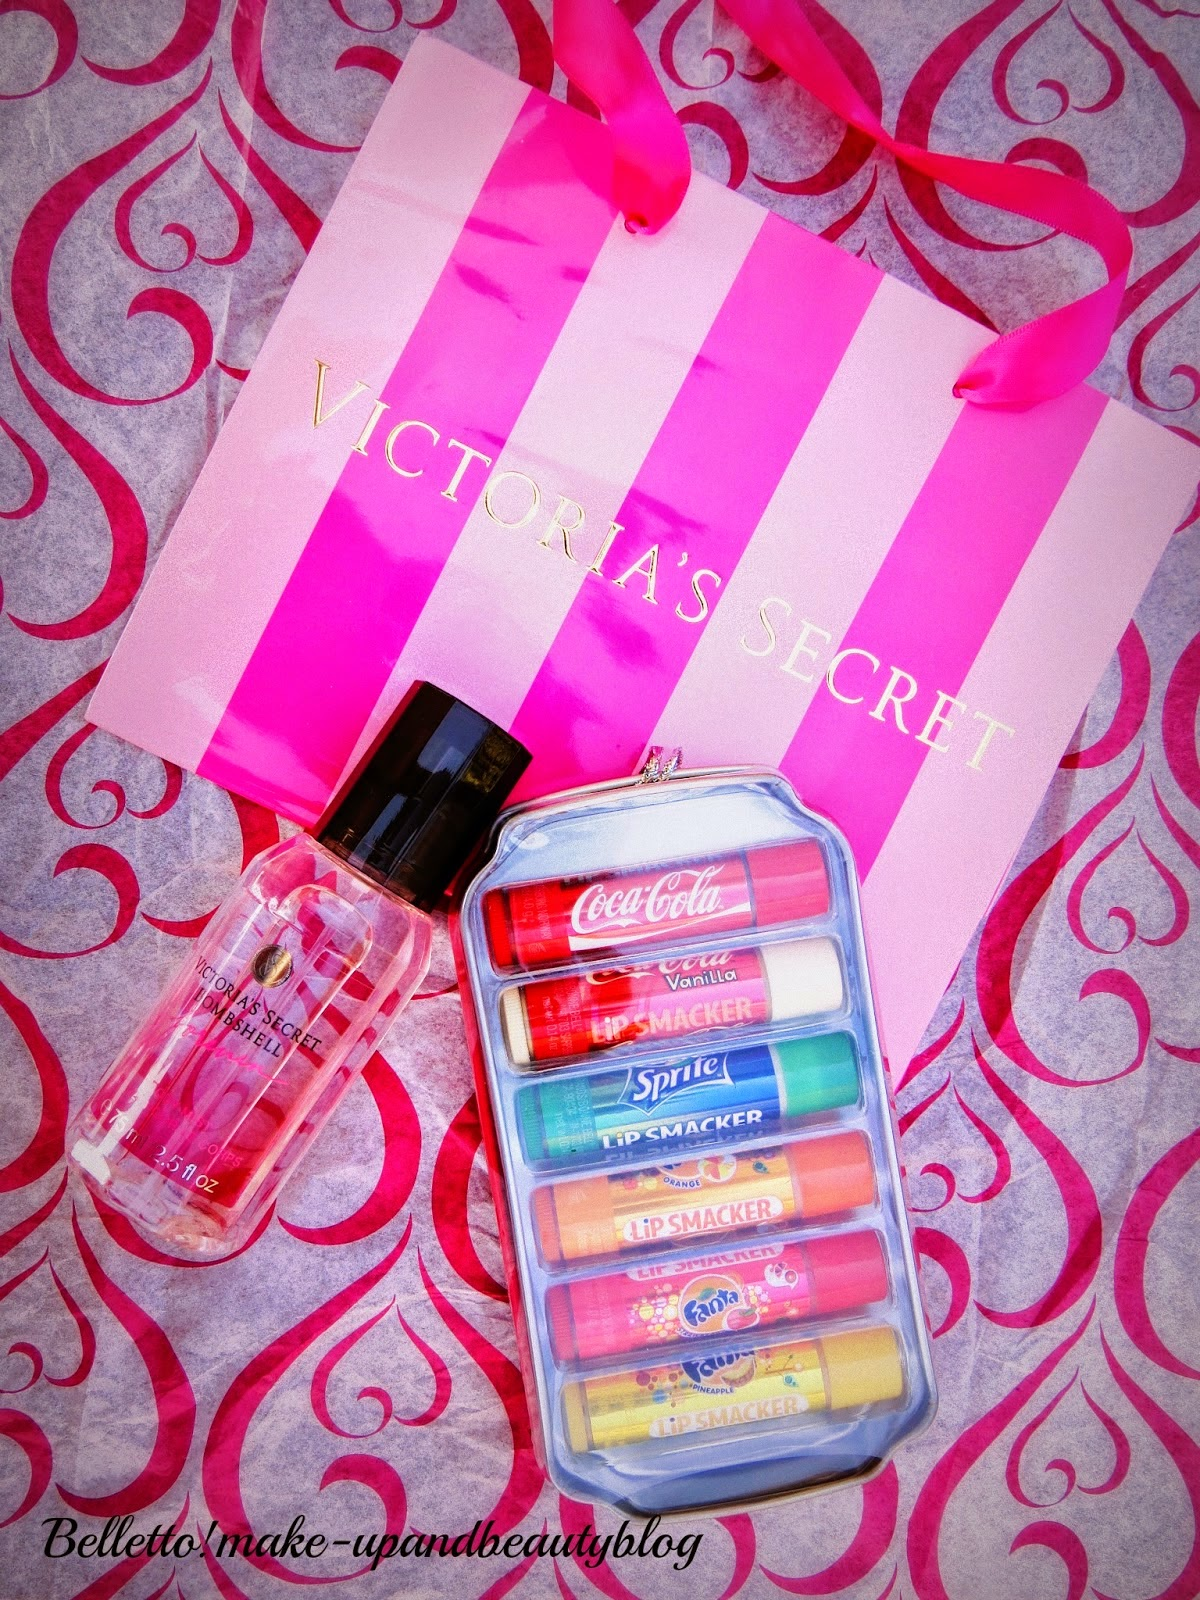 http://bellettomake-upandbeautyblog.blogspot.it/2014/06/summer-2014-giveawayper-il-lato.html?showComment=1402481717362#c36076592859857149